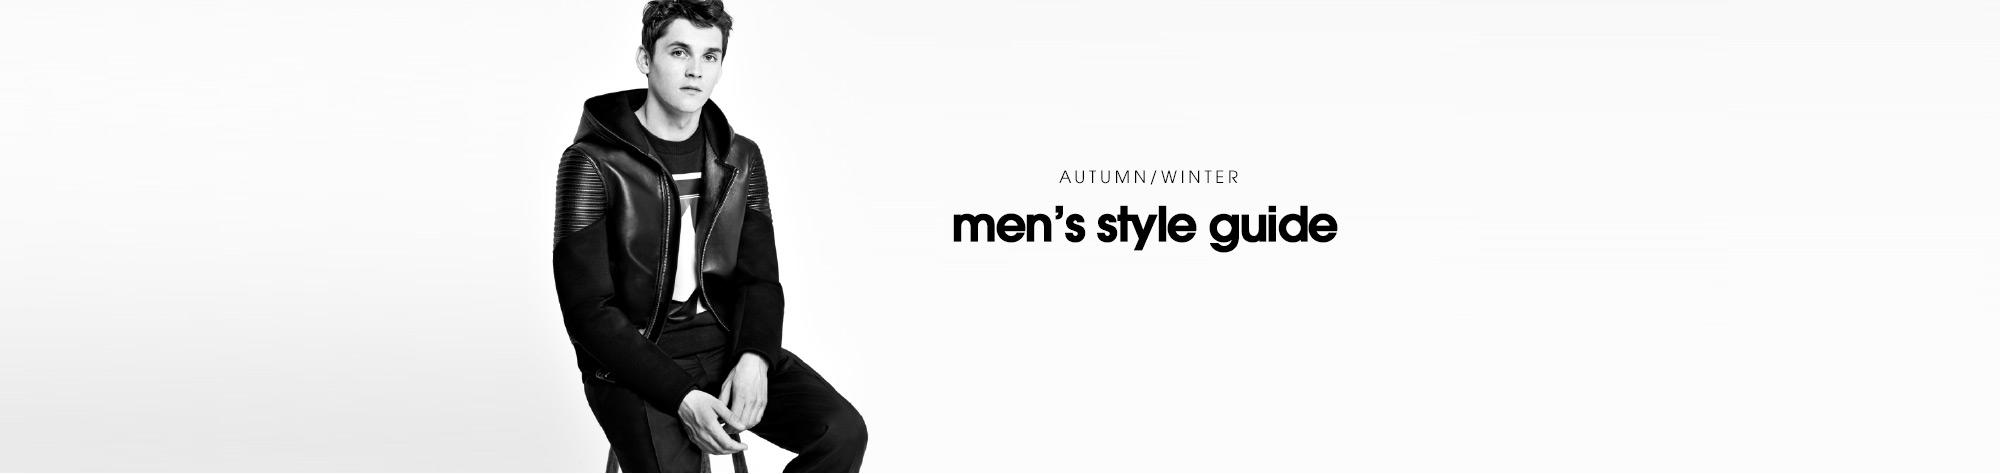 AUTUMN/WINTER men's style guide